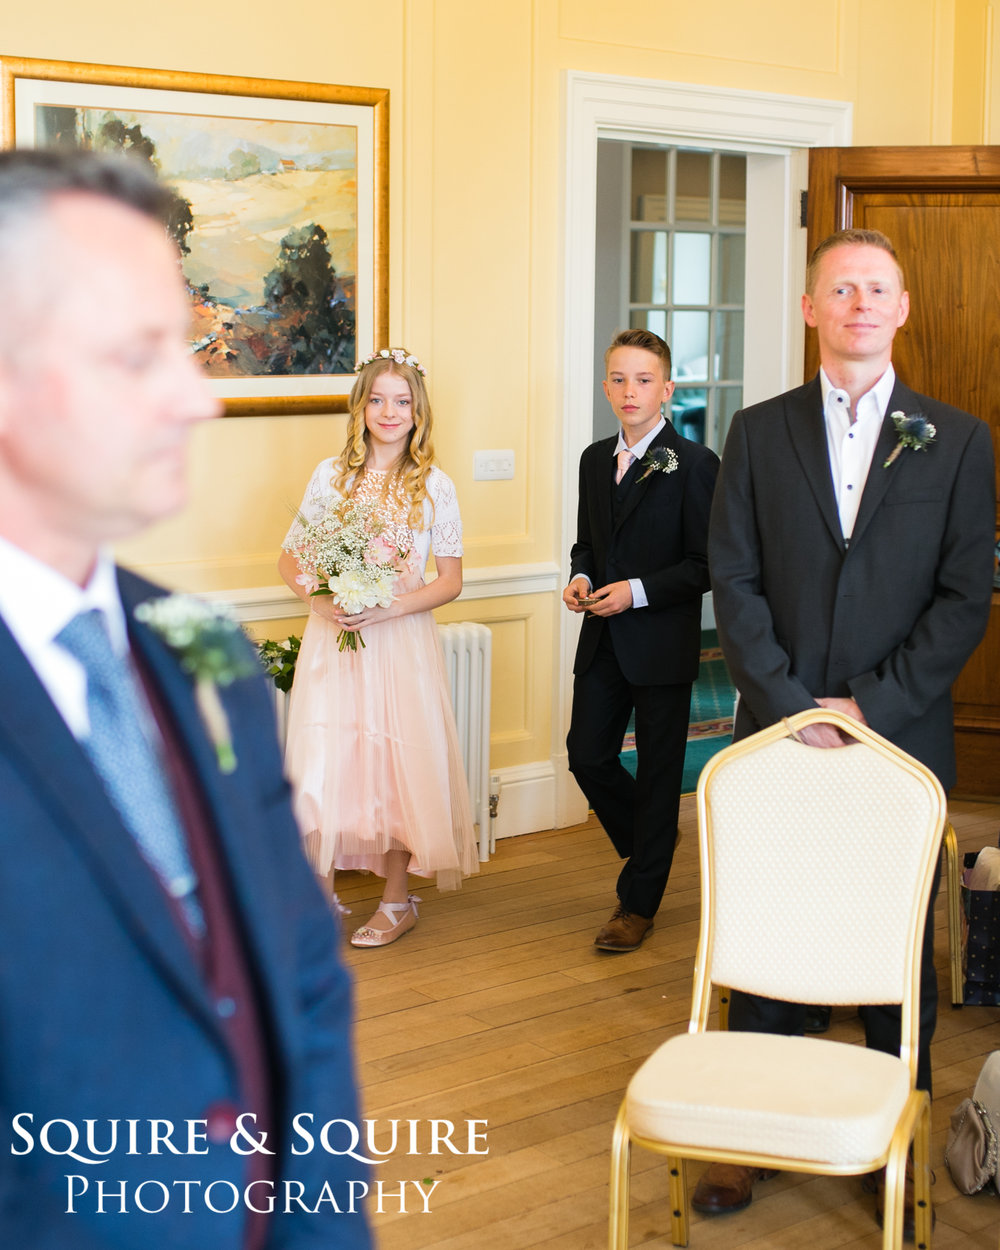 wedding_photography_catthorpe Manor (24 of 66).jpg